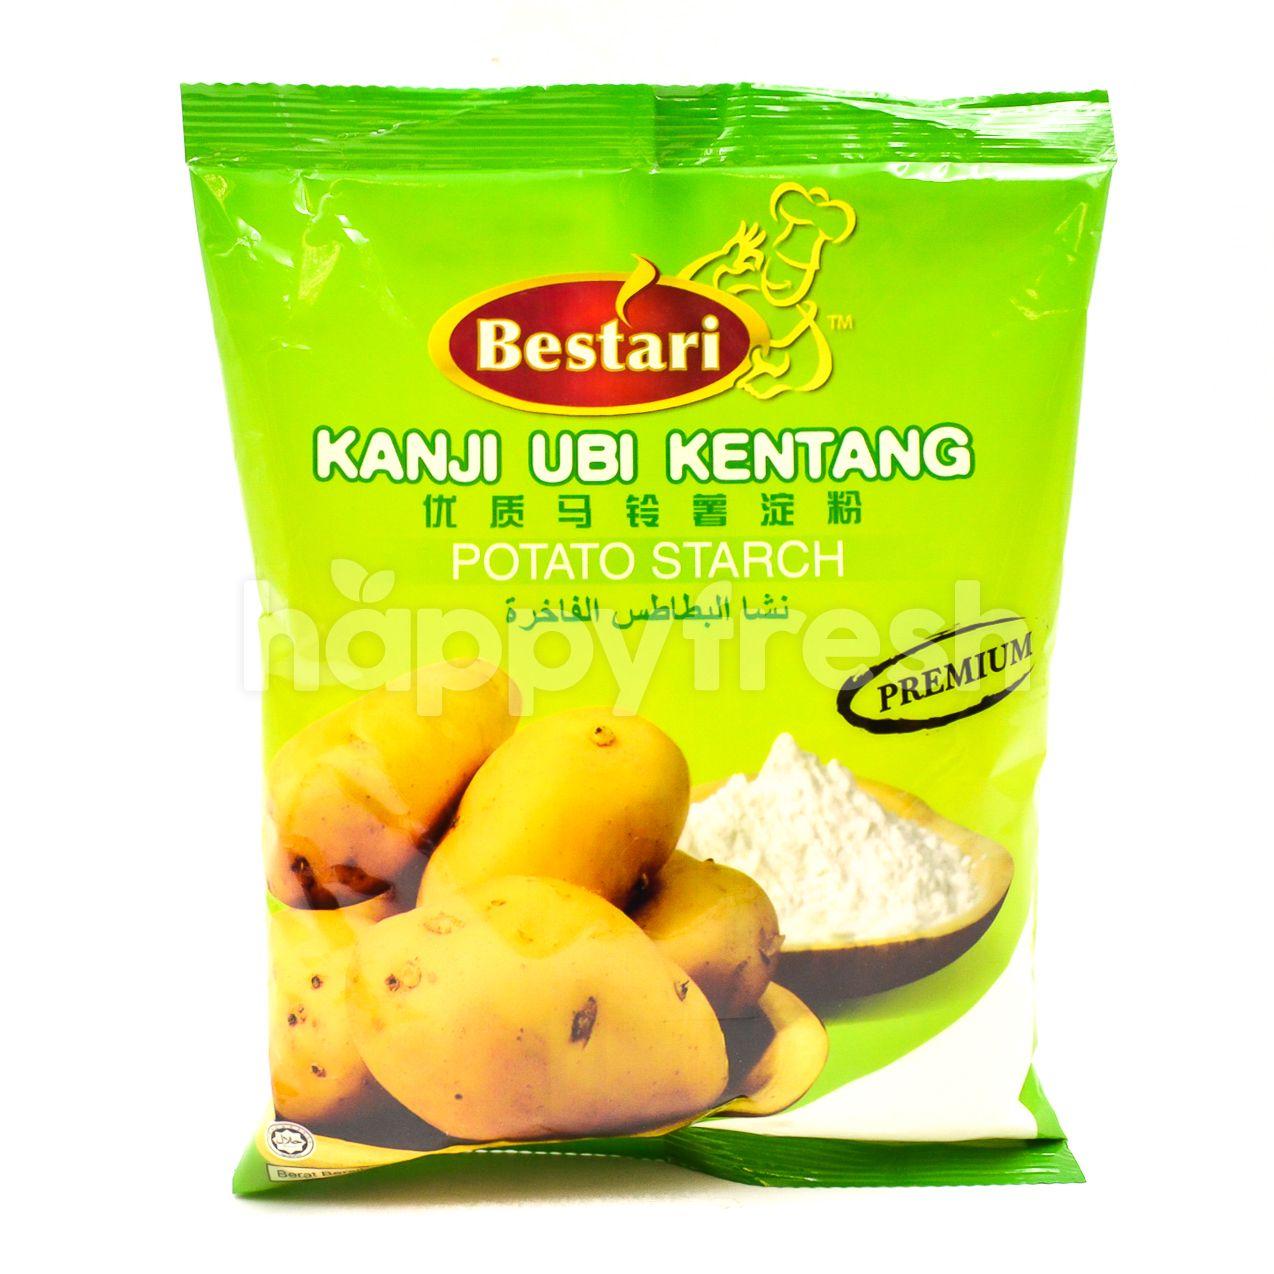 Potato Starch